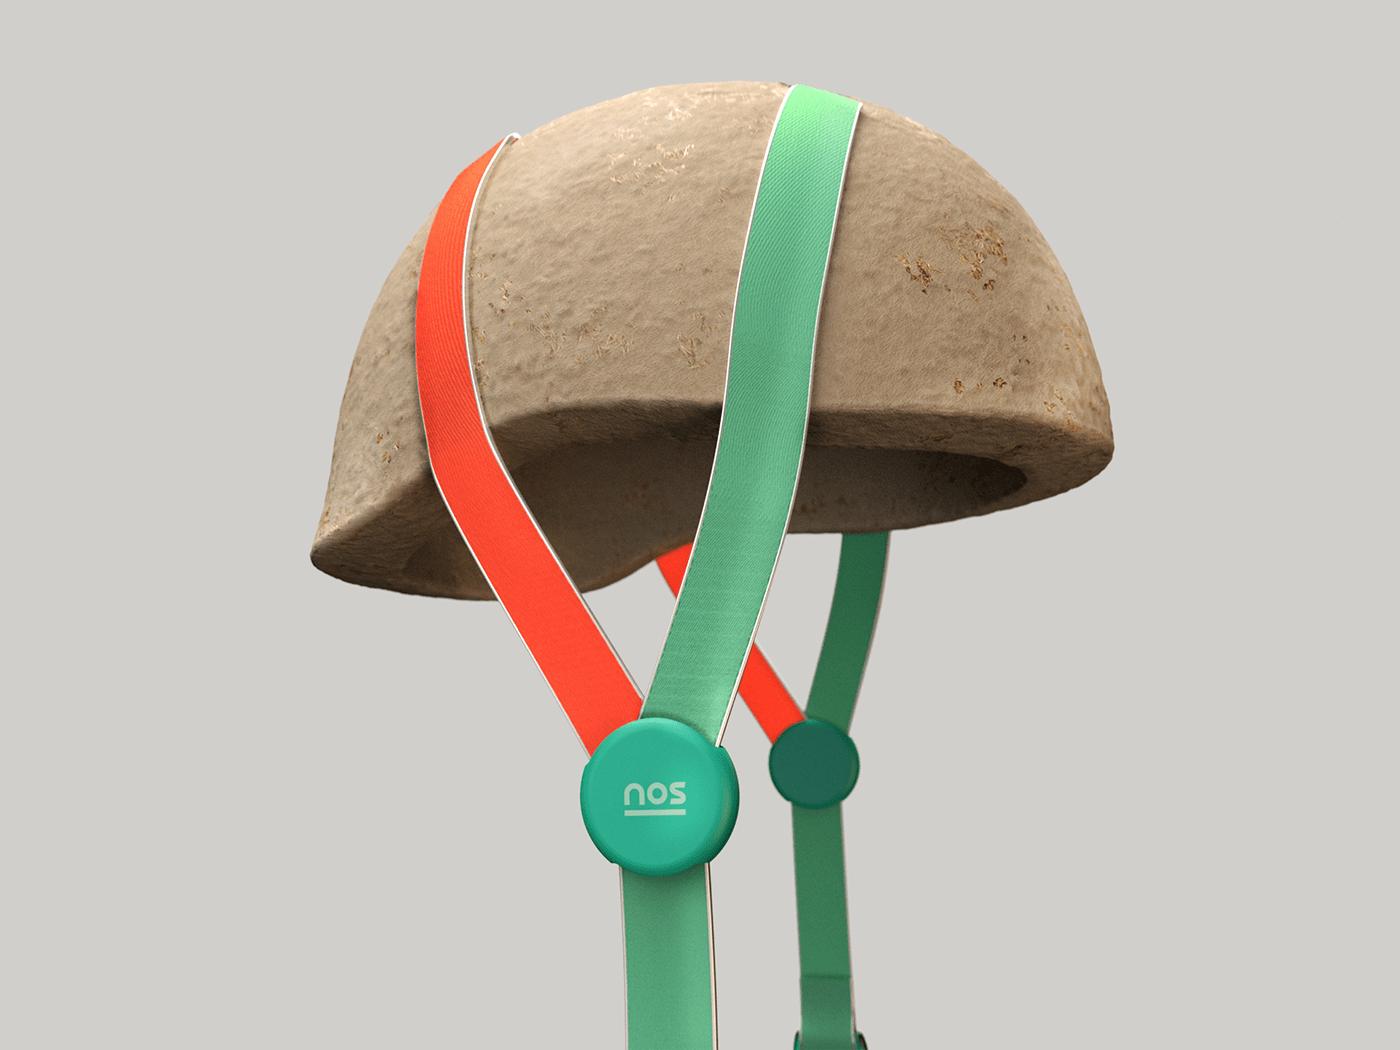 Bike design eco ecofriendly Helmet industrialdesign mobility product design  recyclable